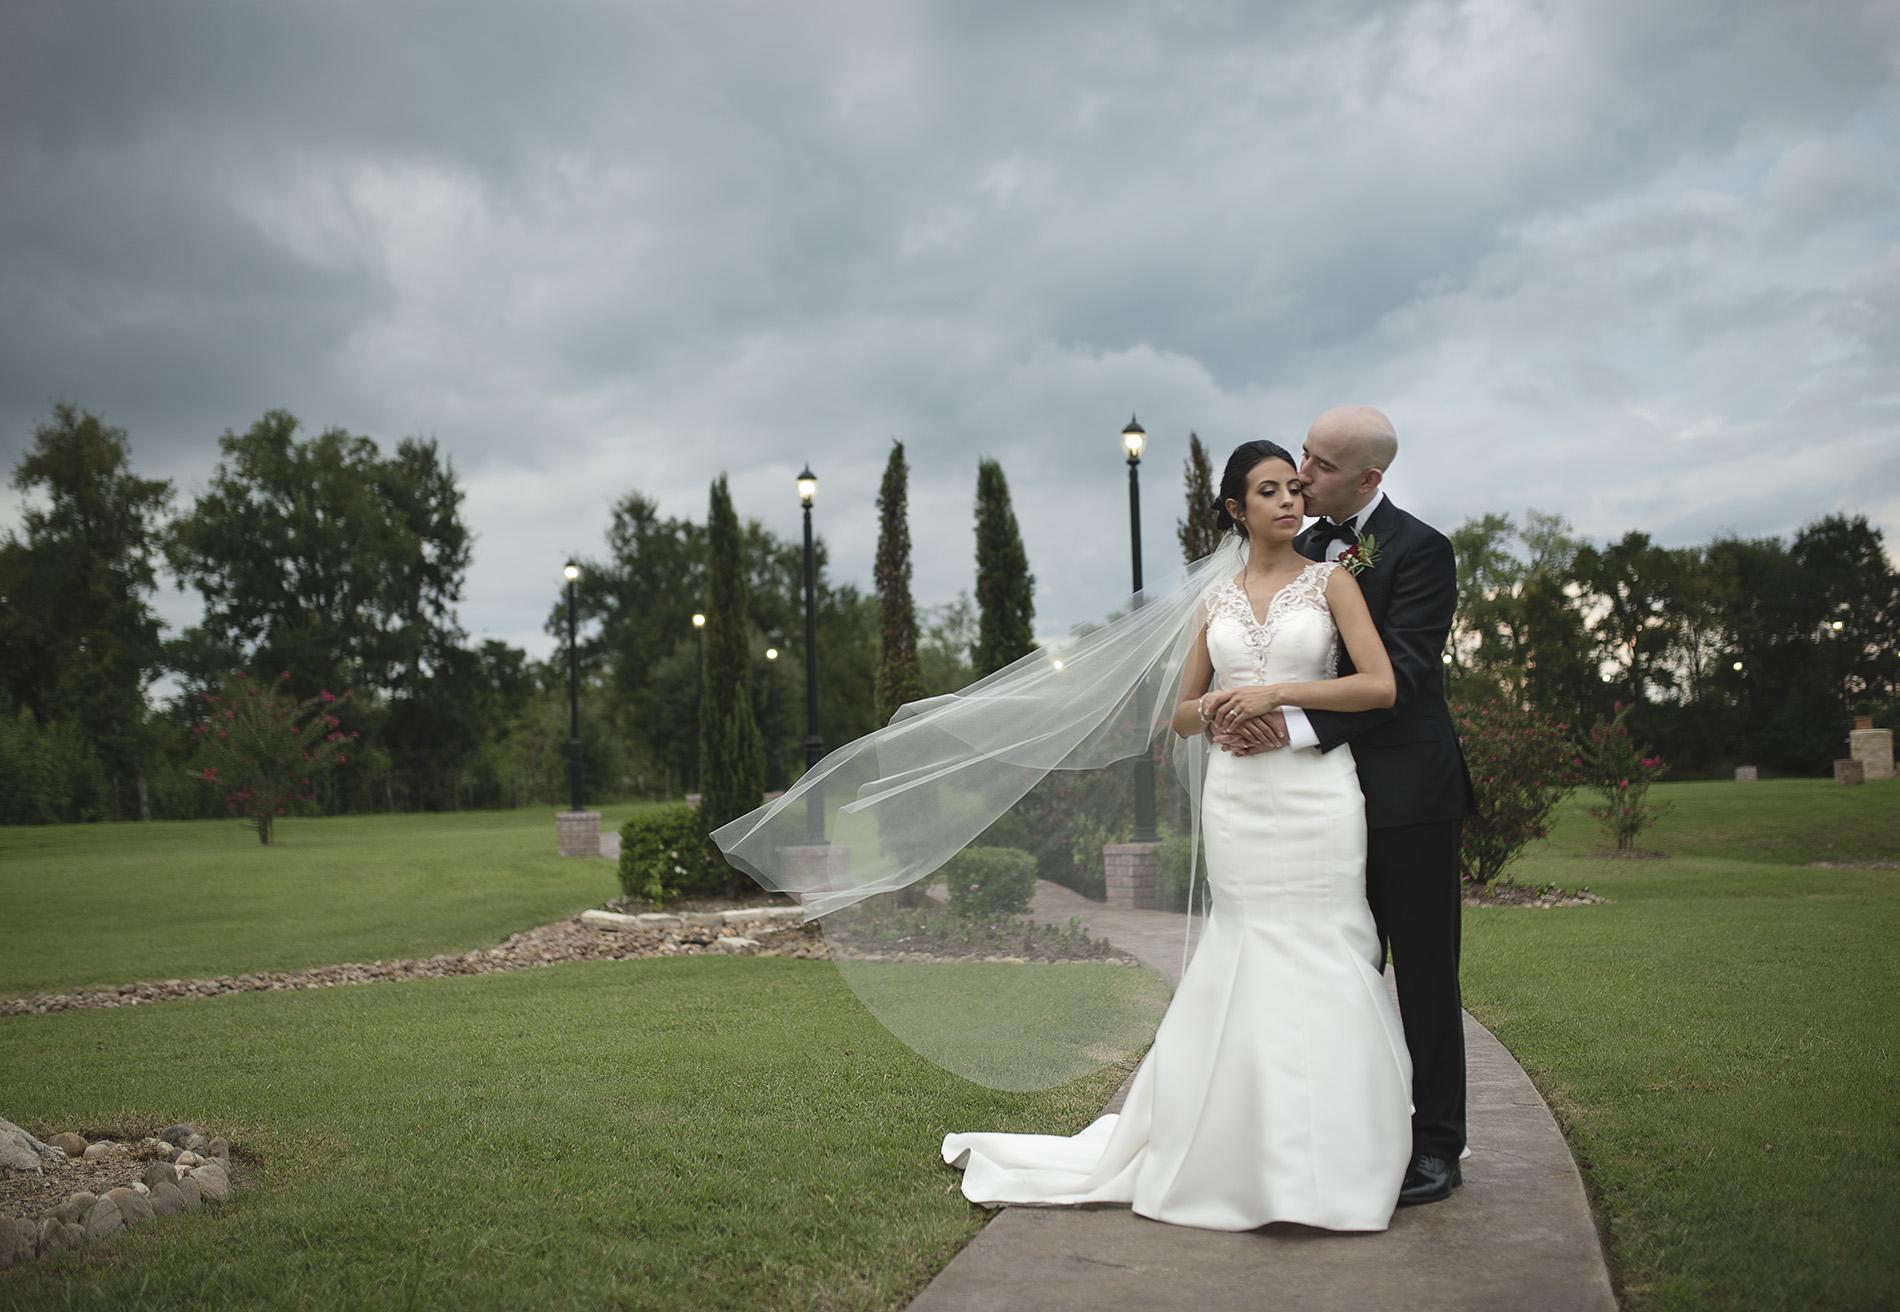 Houston-venue-Olde-Dobbin-Station-Romantic-Classic-Wedding-Photographer-088.jpg